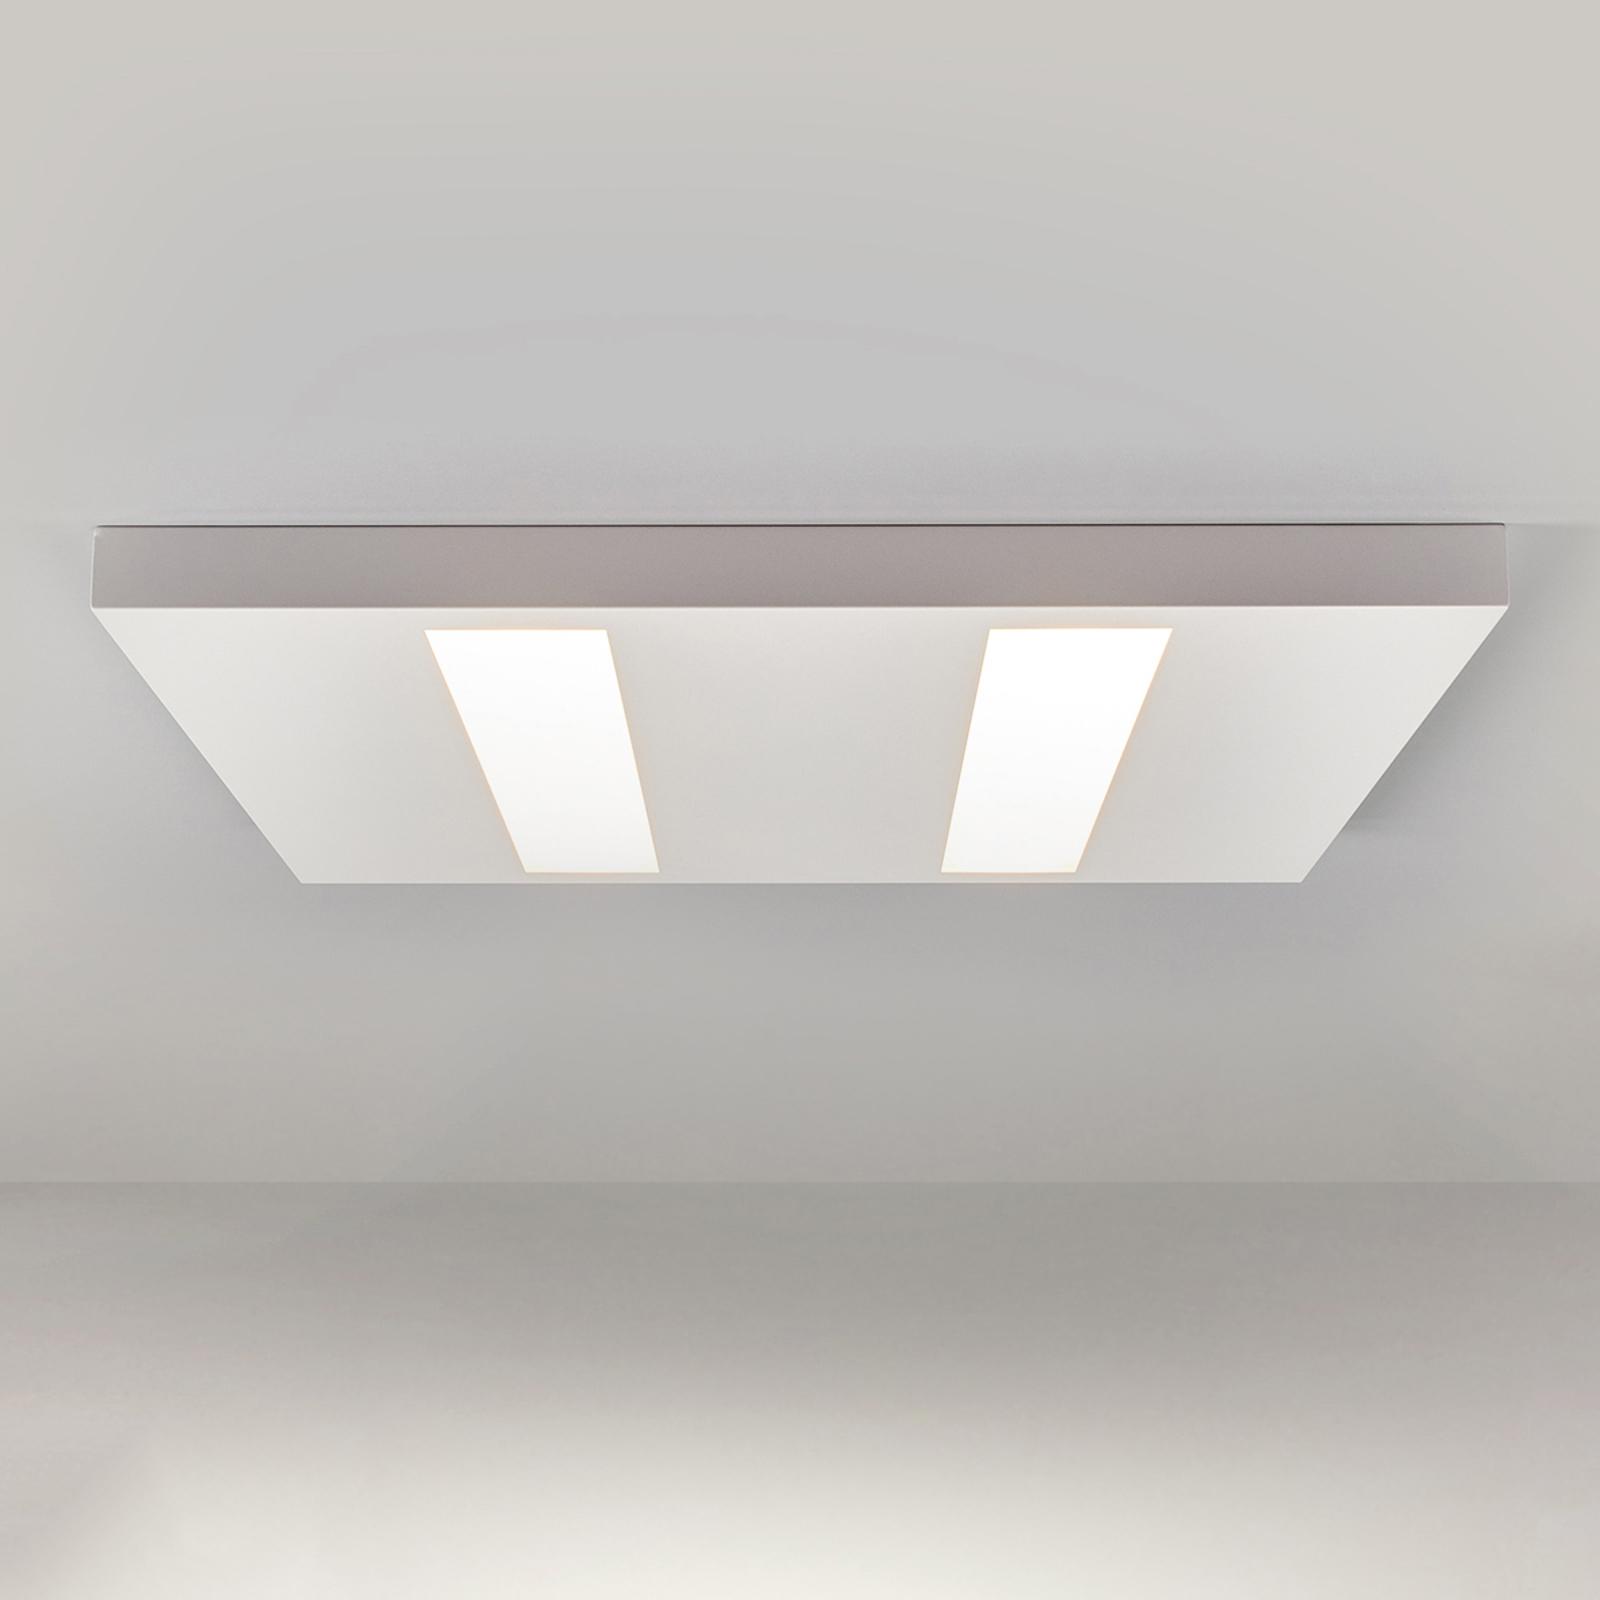 Flache LED-Anbauleuchte 37W weiß, OSRAM-LEDs